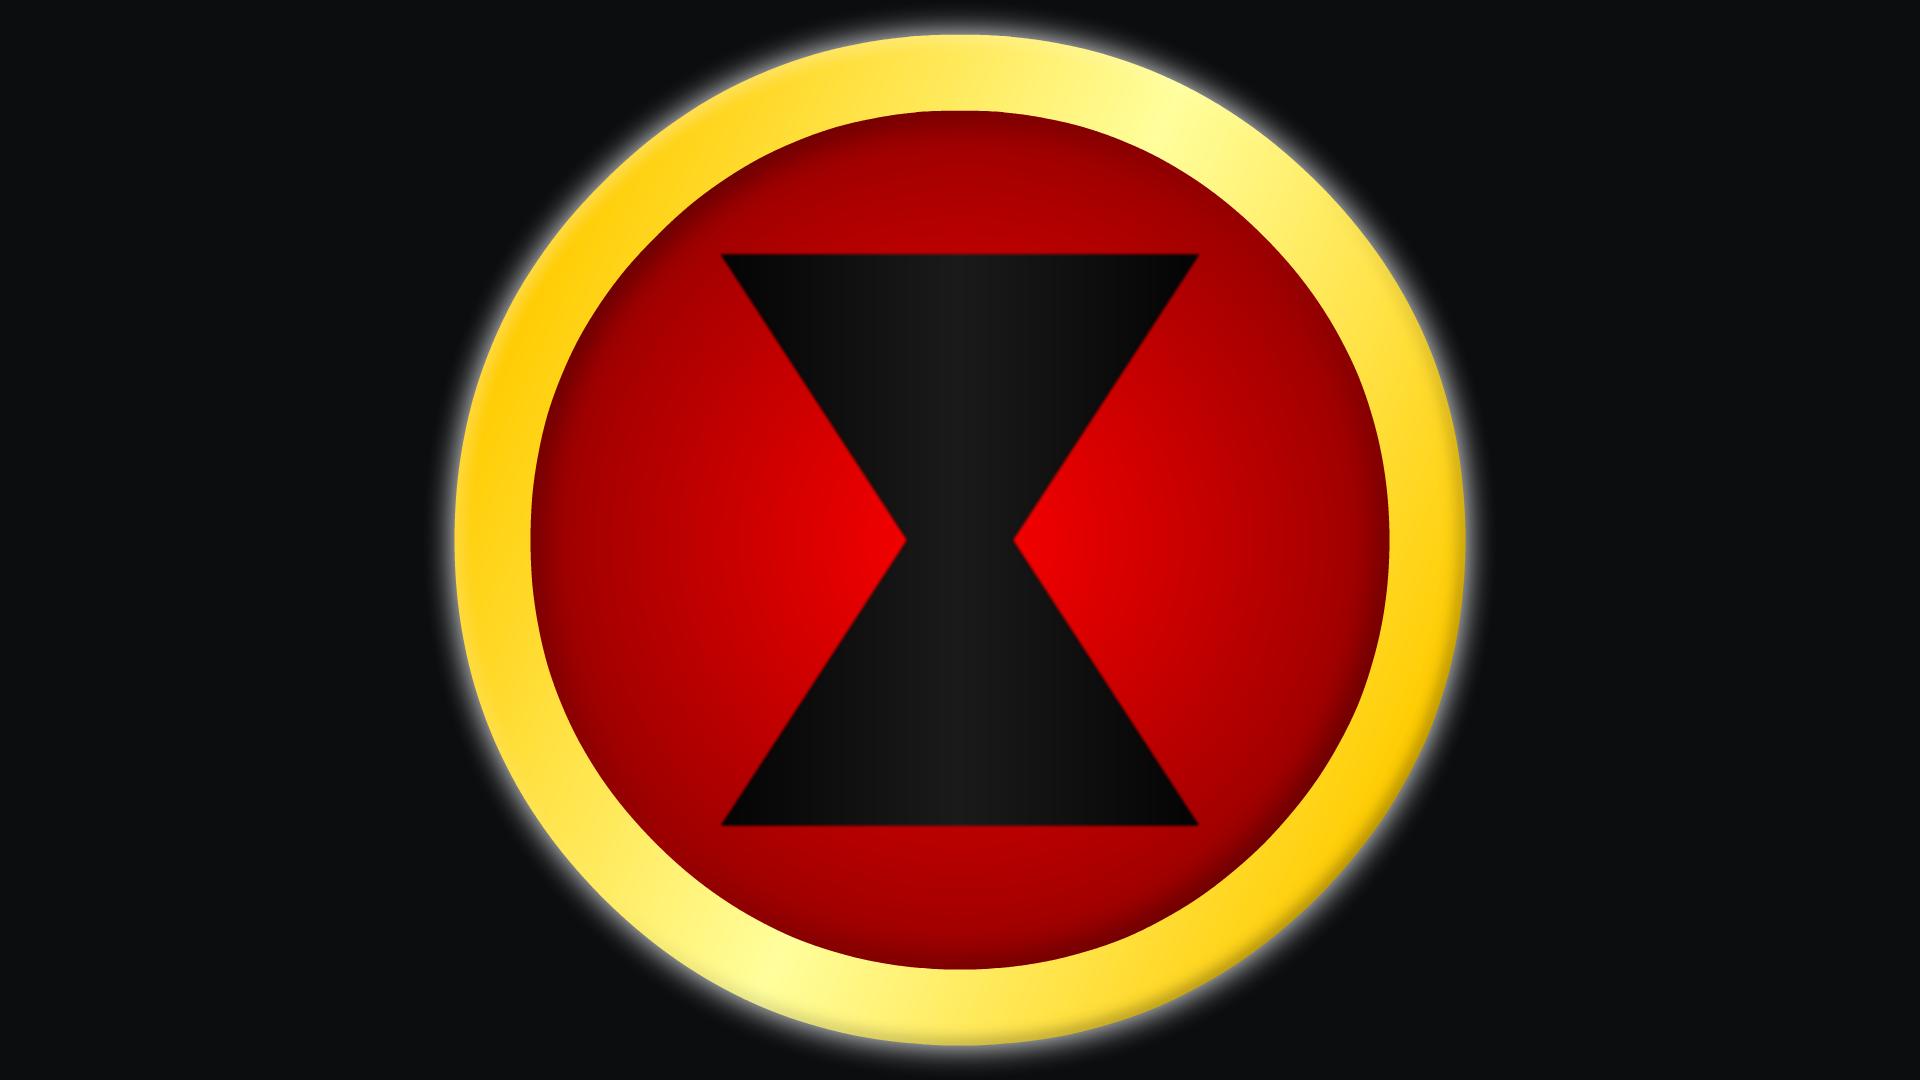 Avengers Black Widow Symbol Anazhthsh Google Avengers Symbols Black Widow Symbol Black Widow Marvel